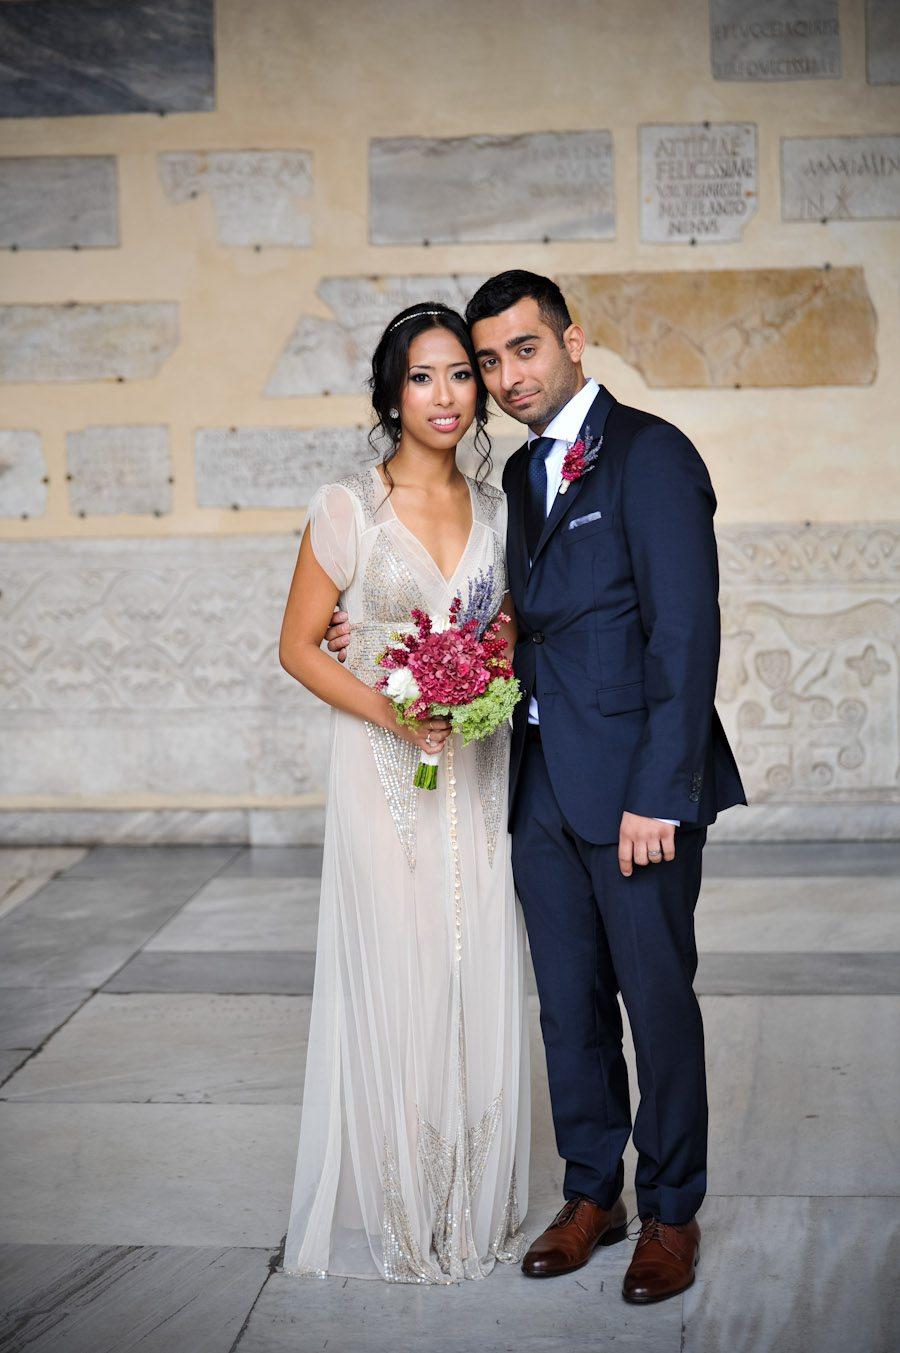 Canadian_Rome_Wedding70